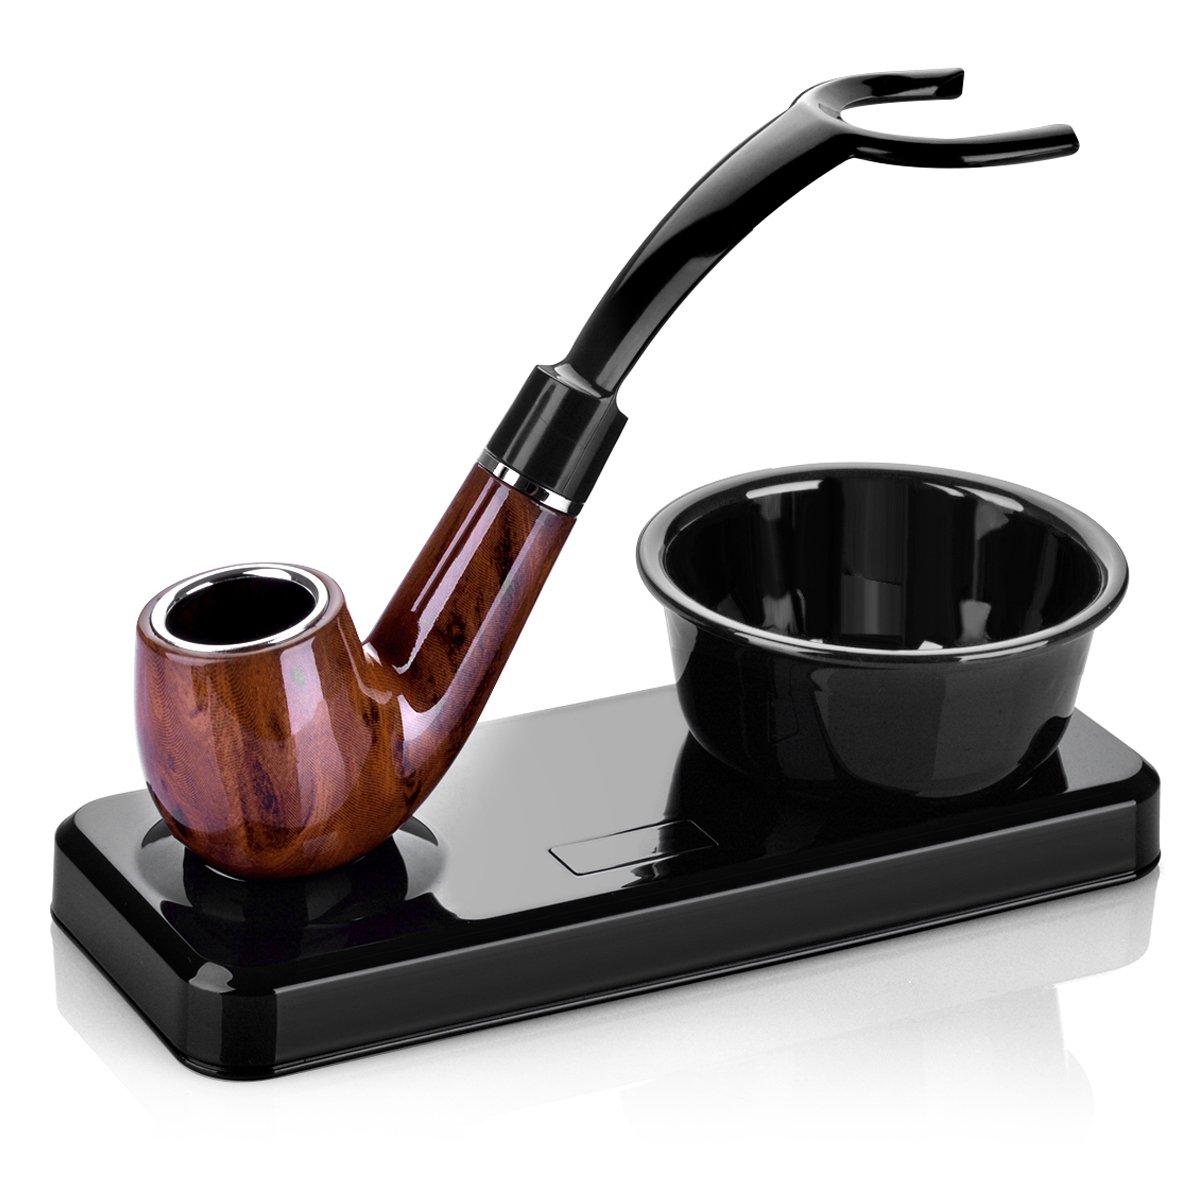 GUDUO Shaving Kit Deluxe Chrome Razor and Brush - Best Design Razor Stand with Razor Brush Blades and Bowl Stand (Black)